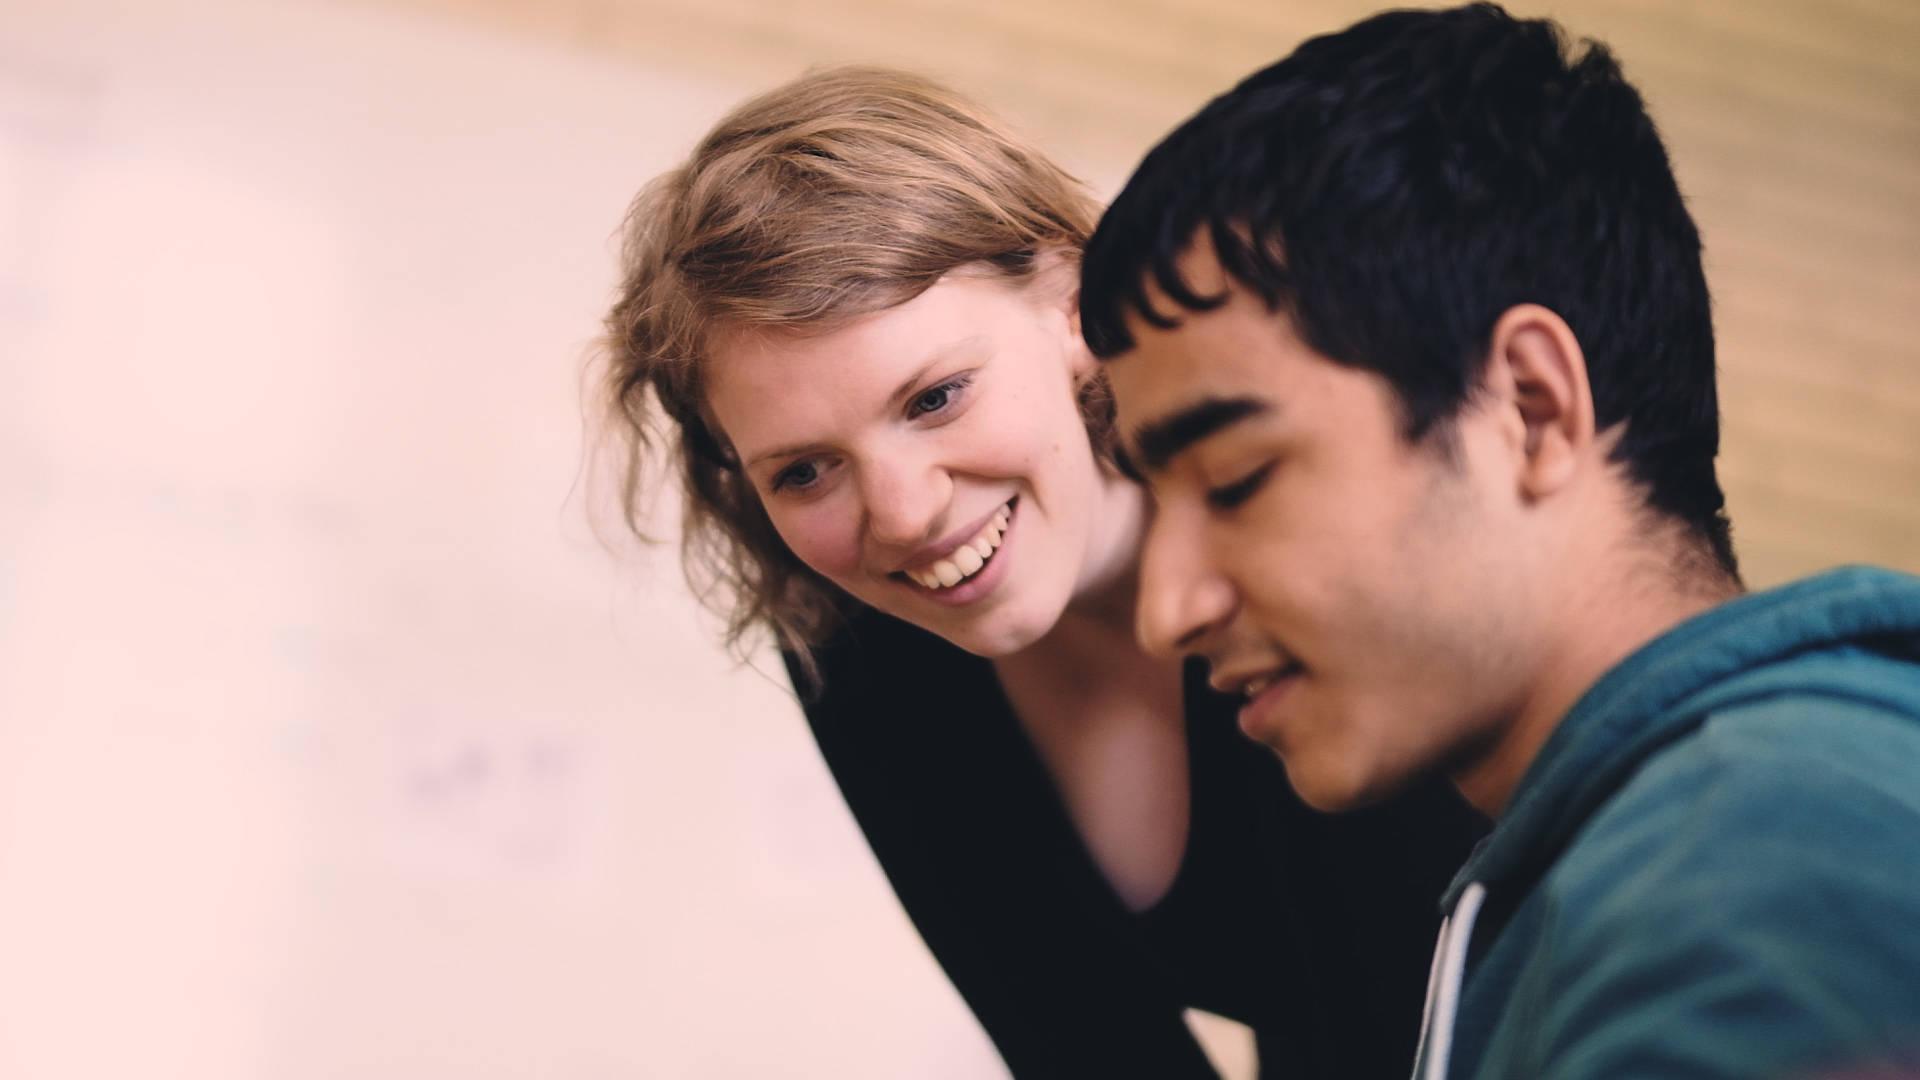 Pressefoto Fellow mit Schüler